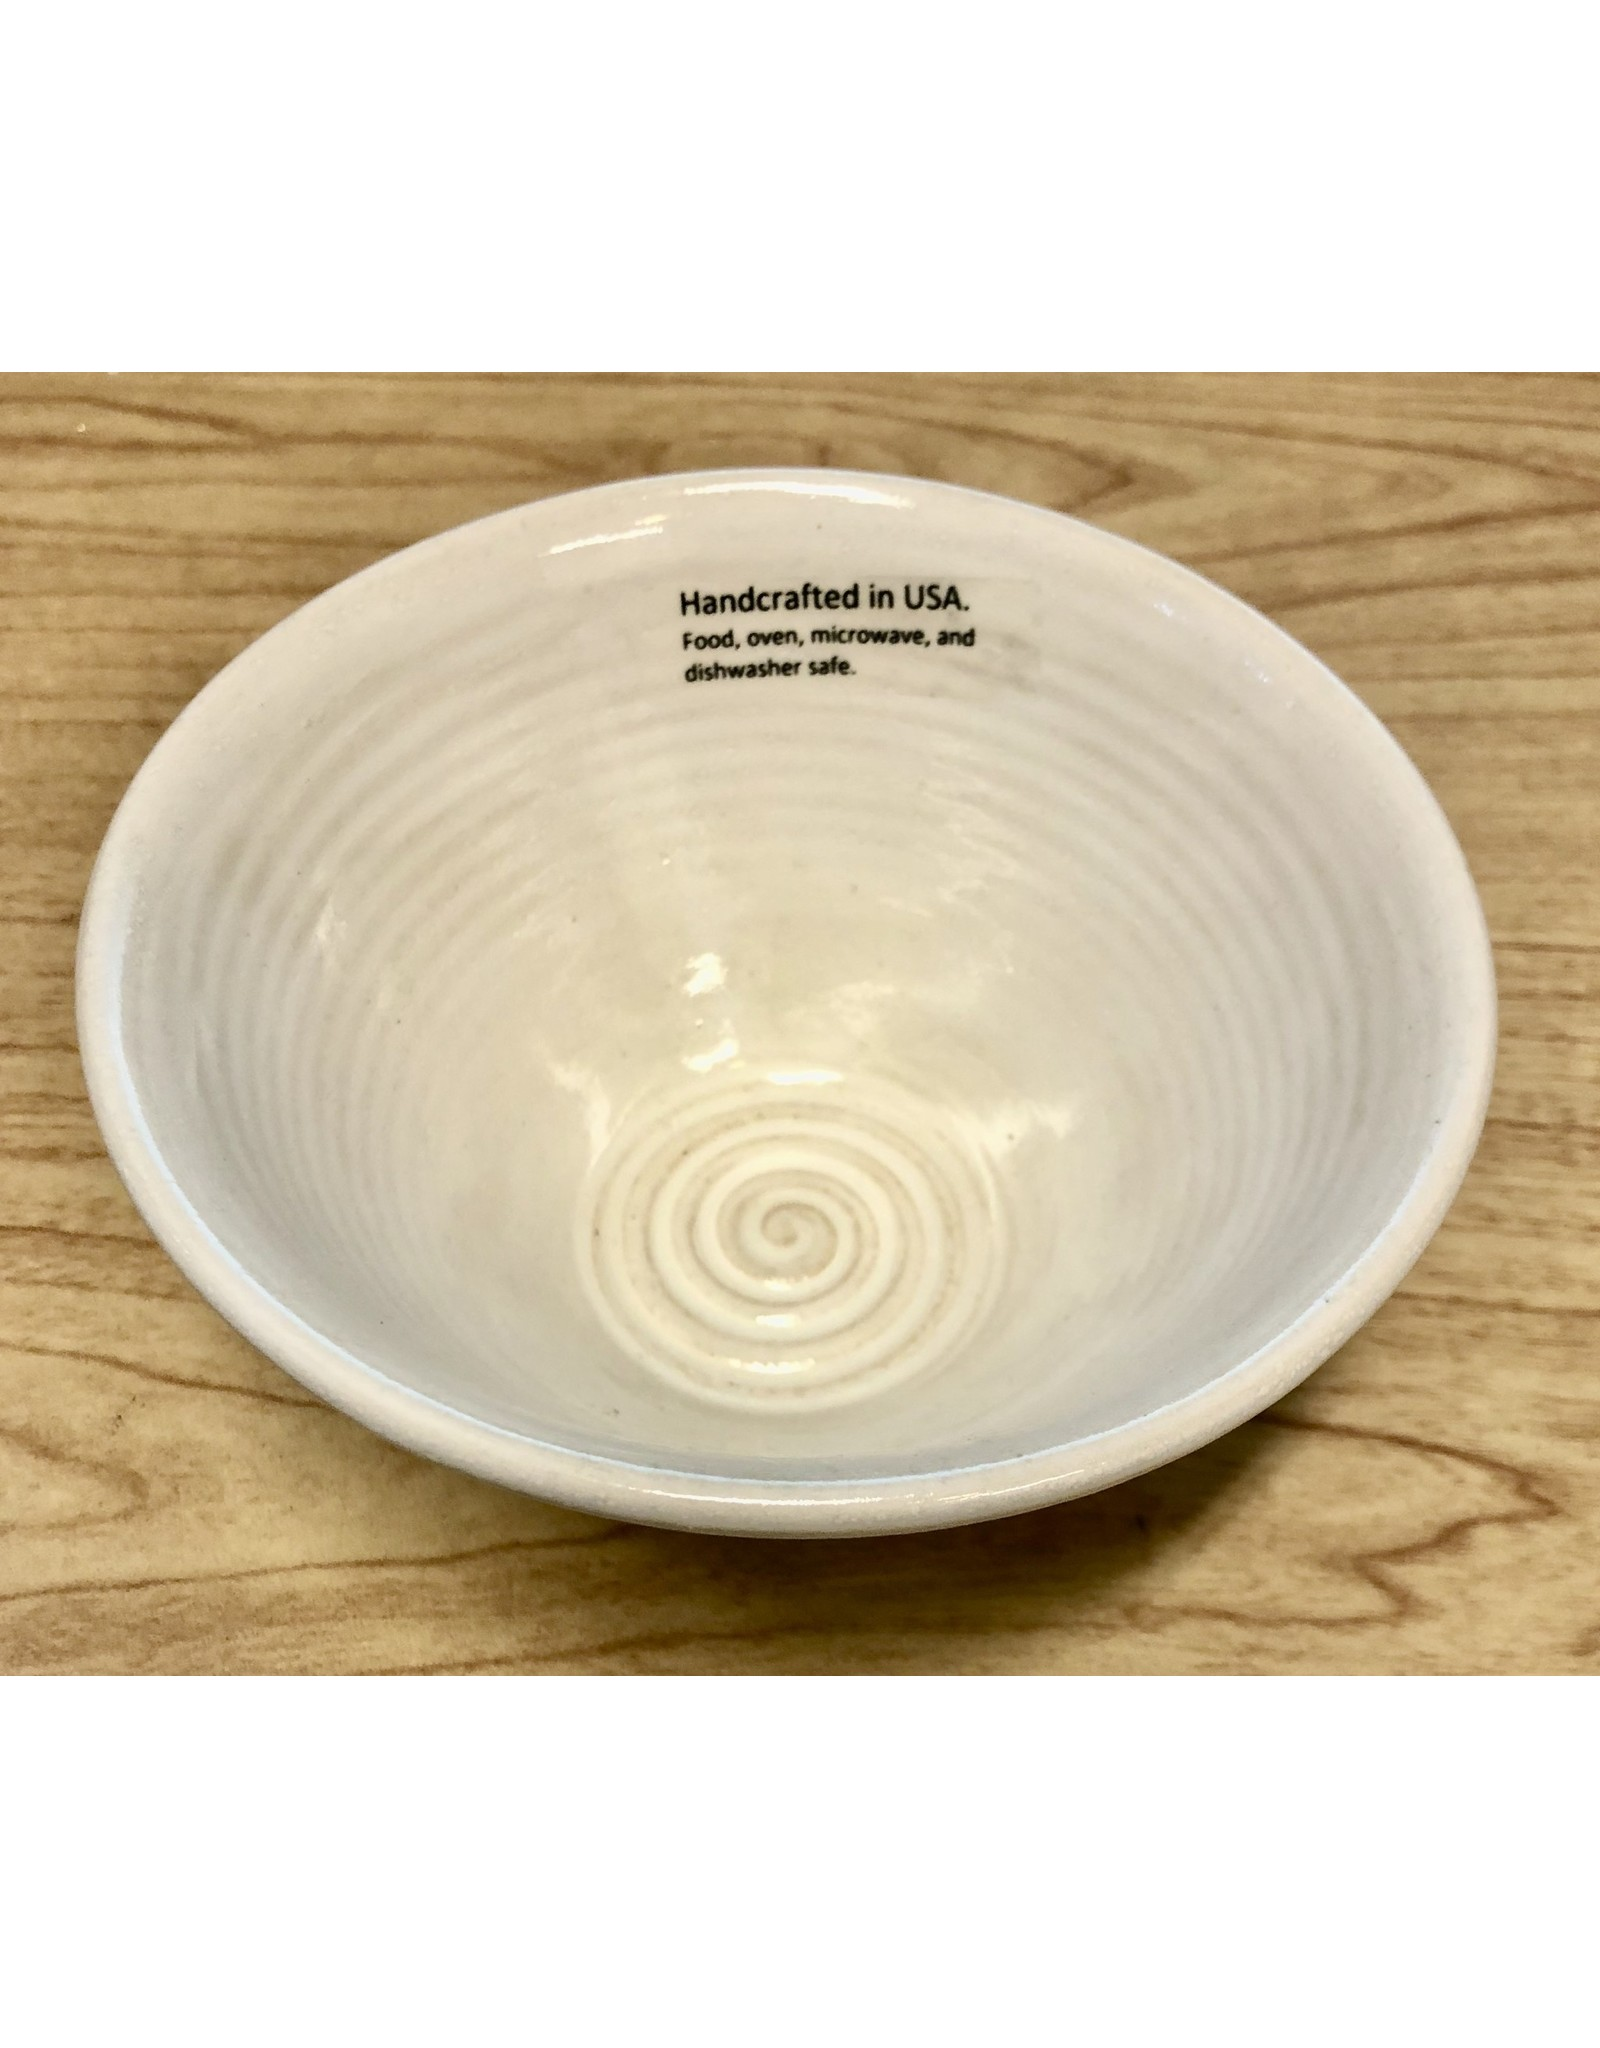 Clarkware Pottery SNACK BOWL